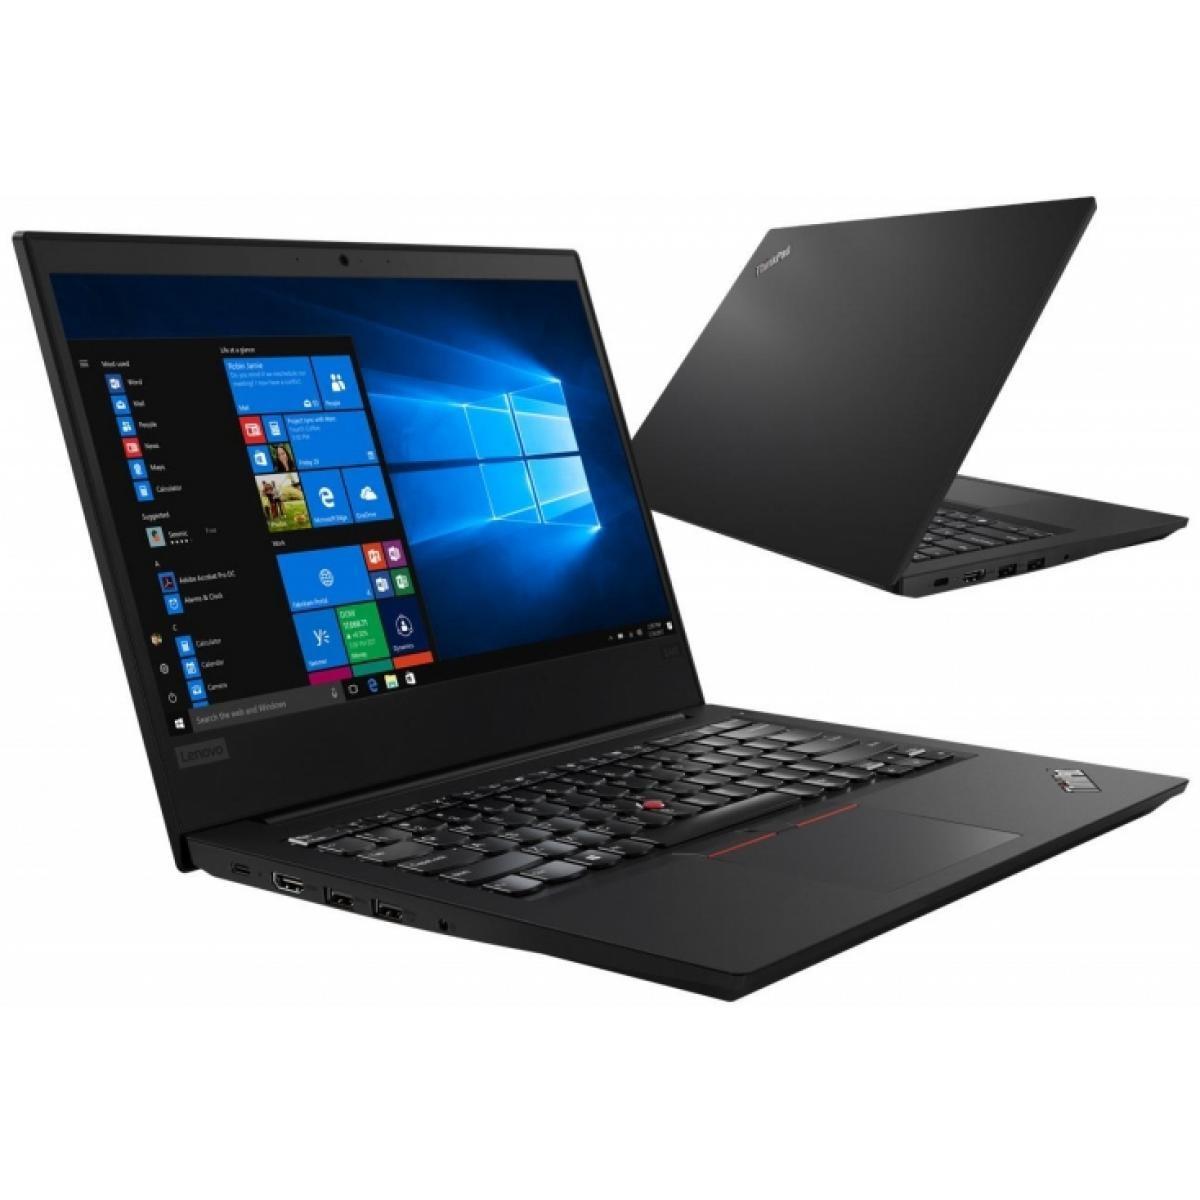 Lenovo ThinkPad E490 - 20N8S0CK00